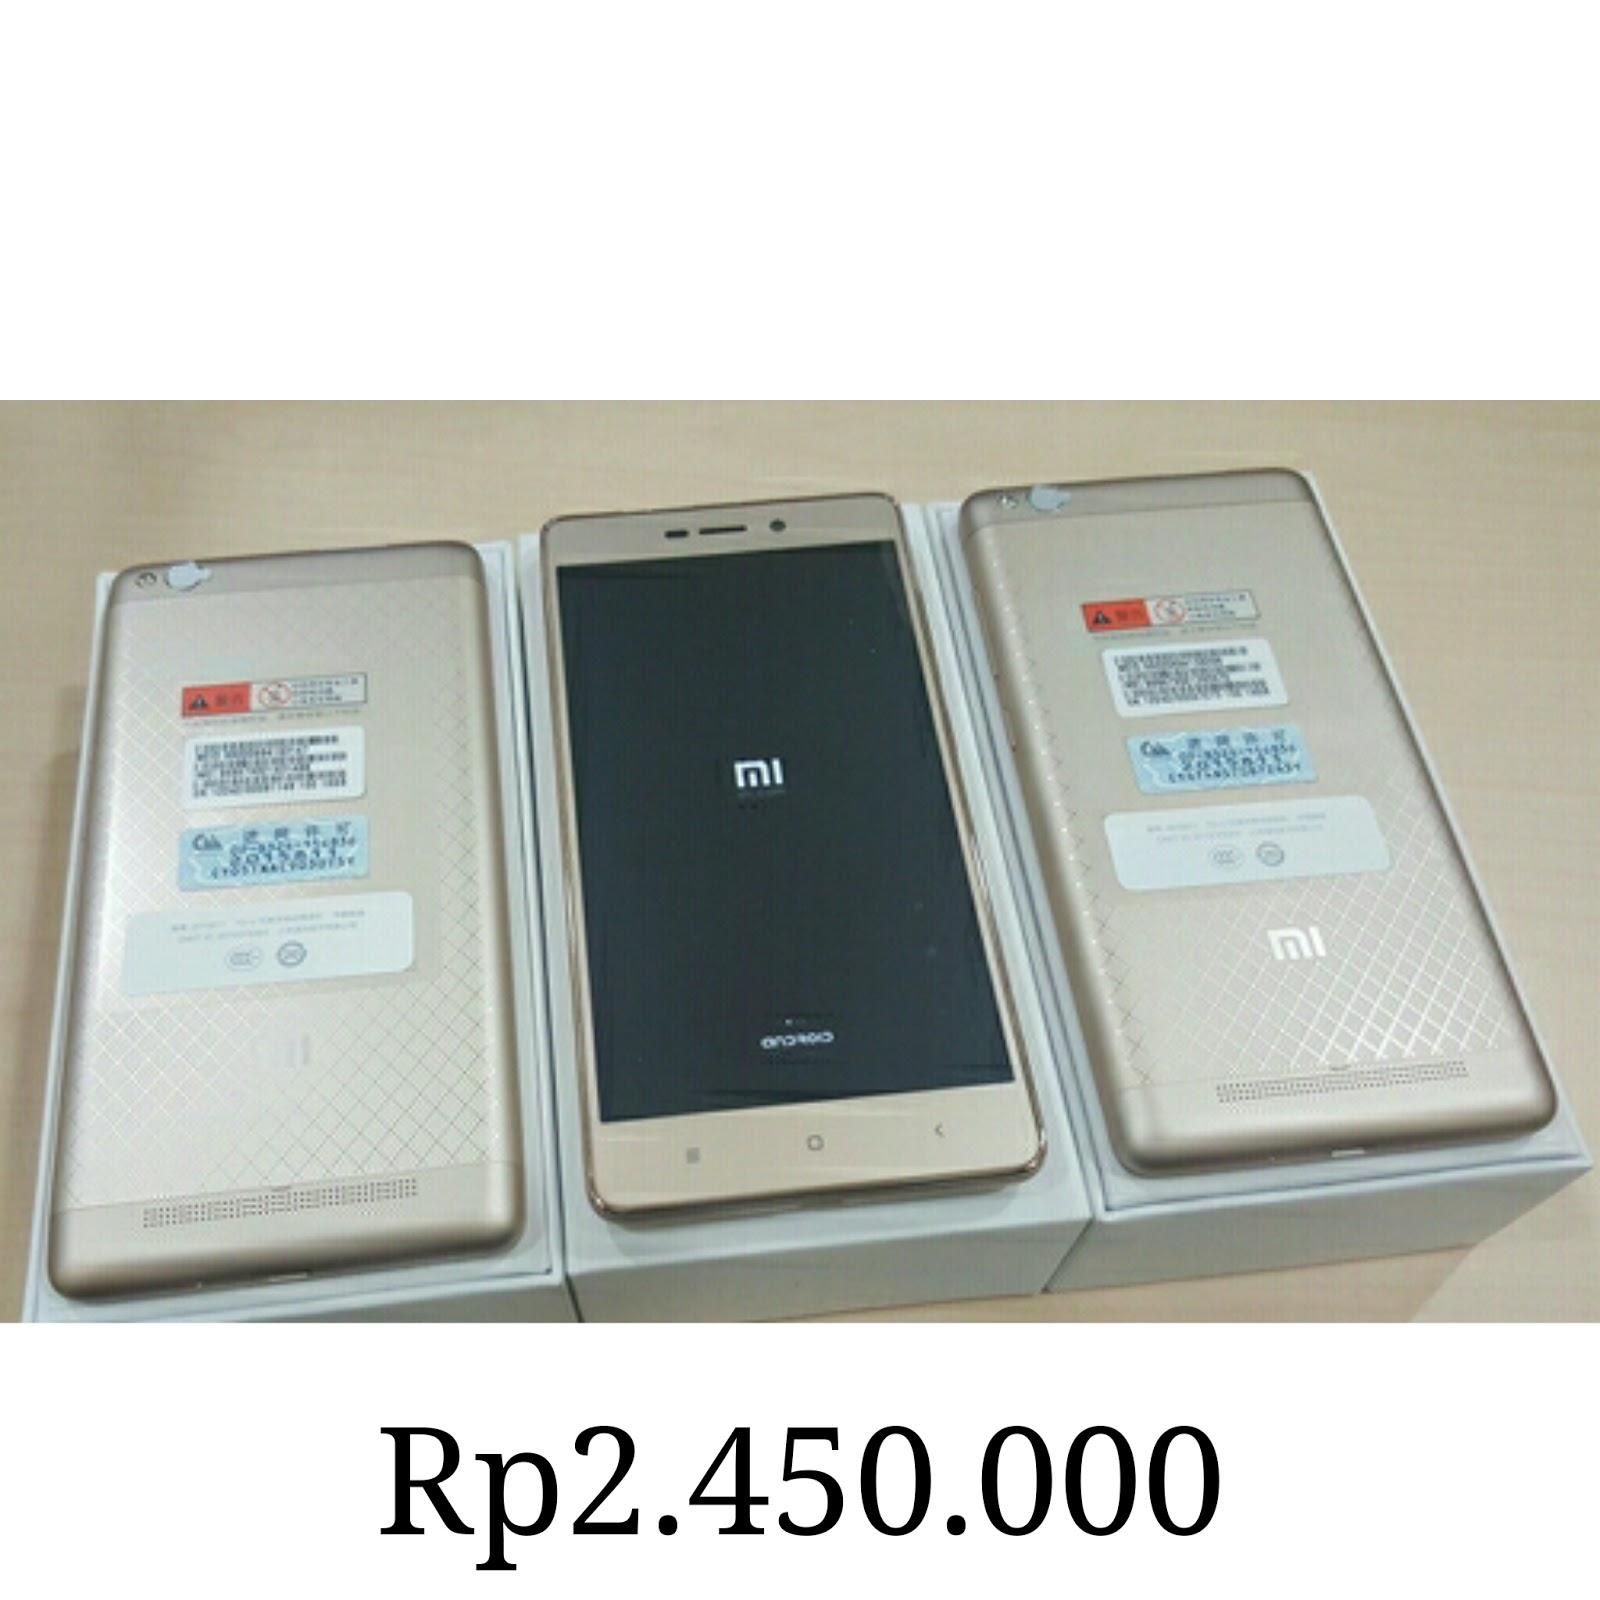 Xiaomi Redmi 2 4g Lte Ram 16gb Rom 8gb Annds Gadget Black White 1gb 8 Gb Garansi Distributor 3 Gold 2gb